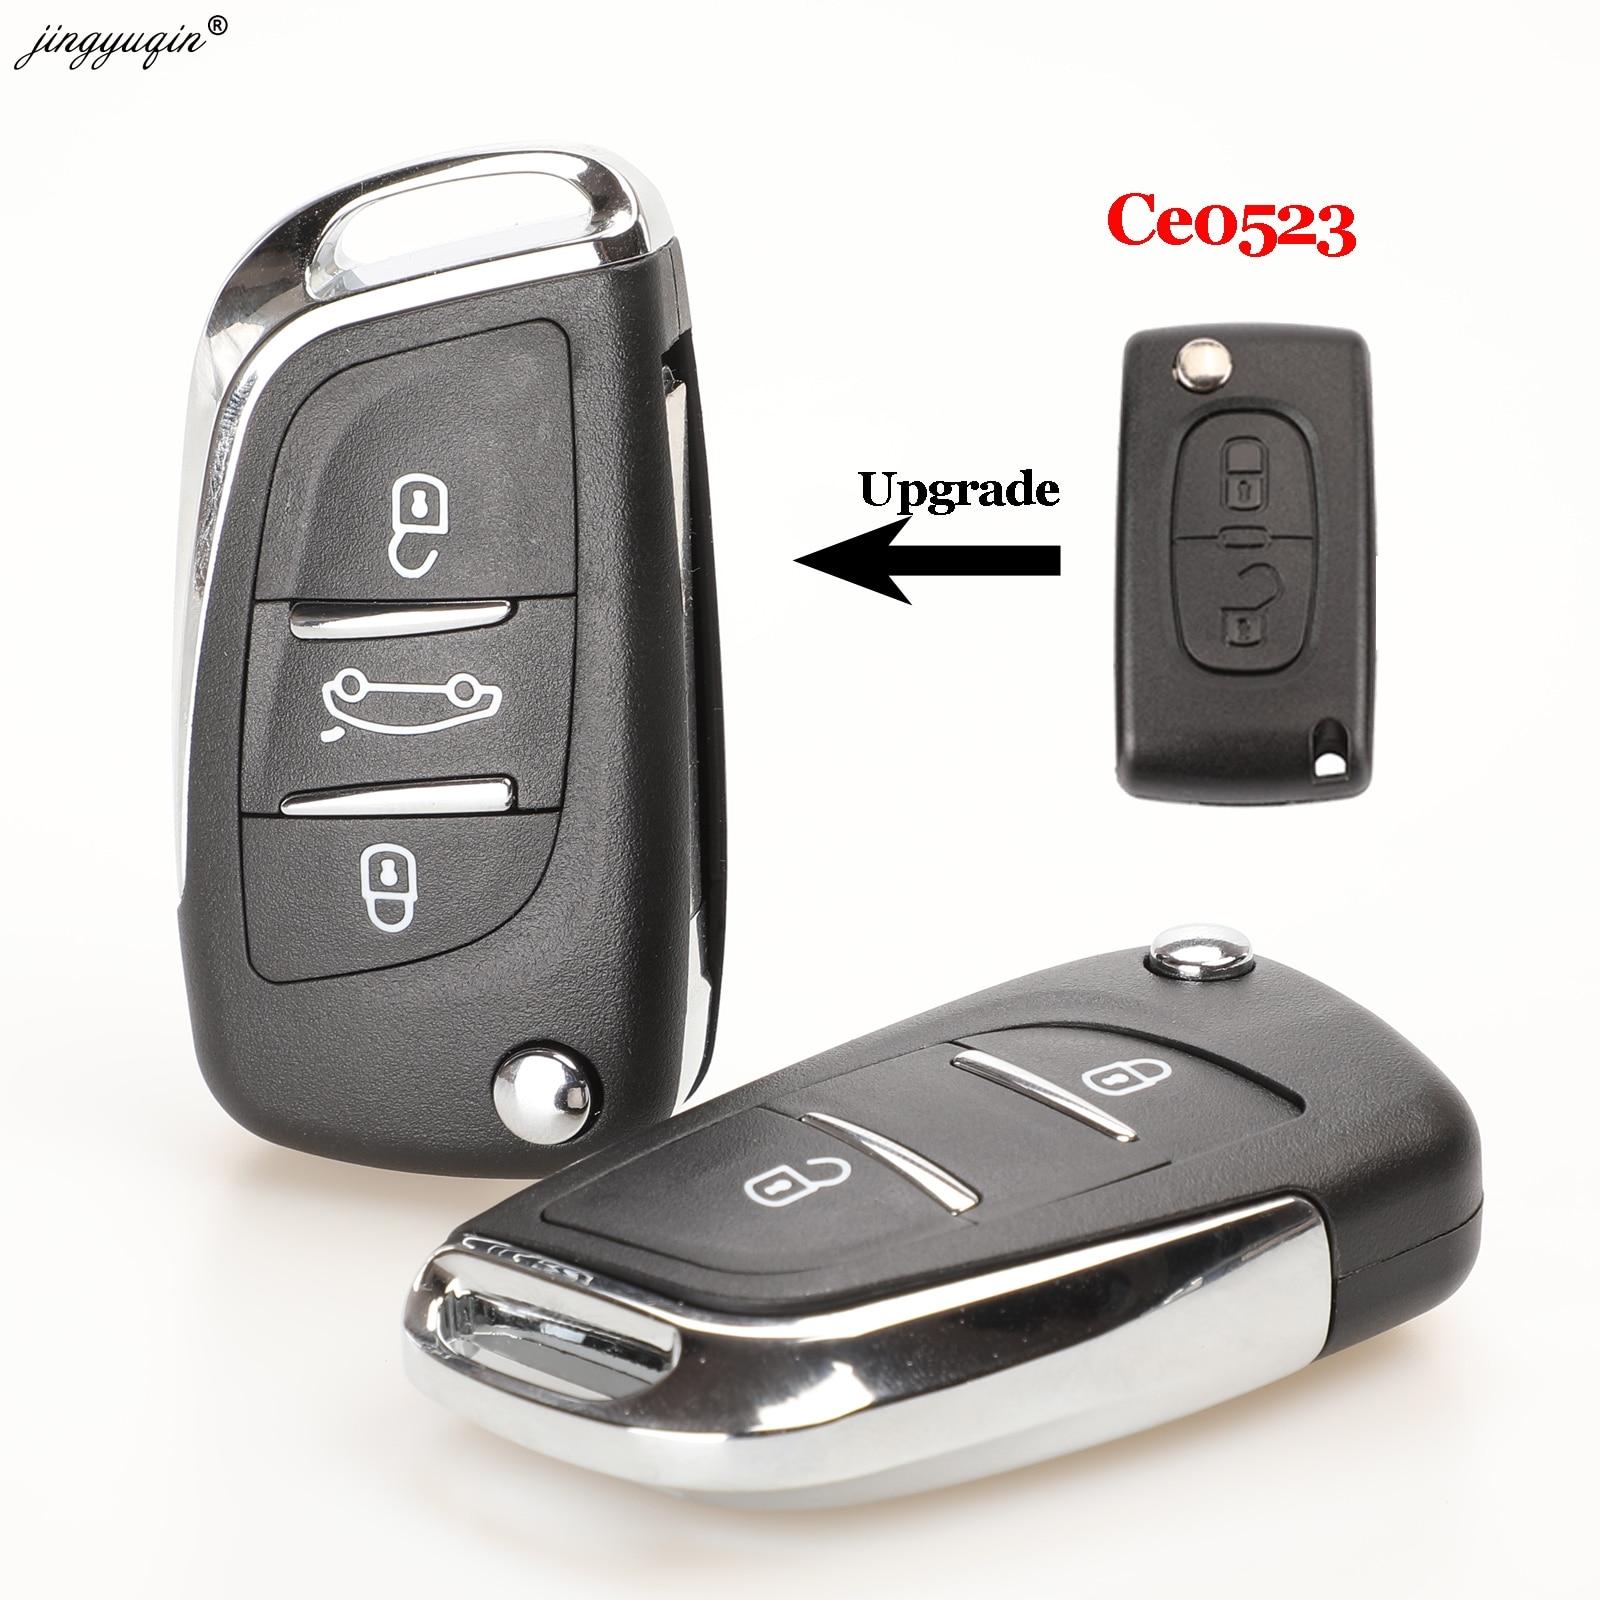 Jingyuqin va2/hu83 2/3b ce0523 modificado flip remoto chave do carro escudo para citroen coupe vtr c2 c4 c5 c6 c8 berlingo xsara picasso